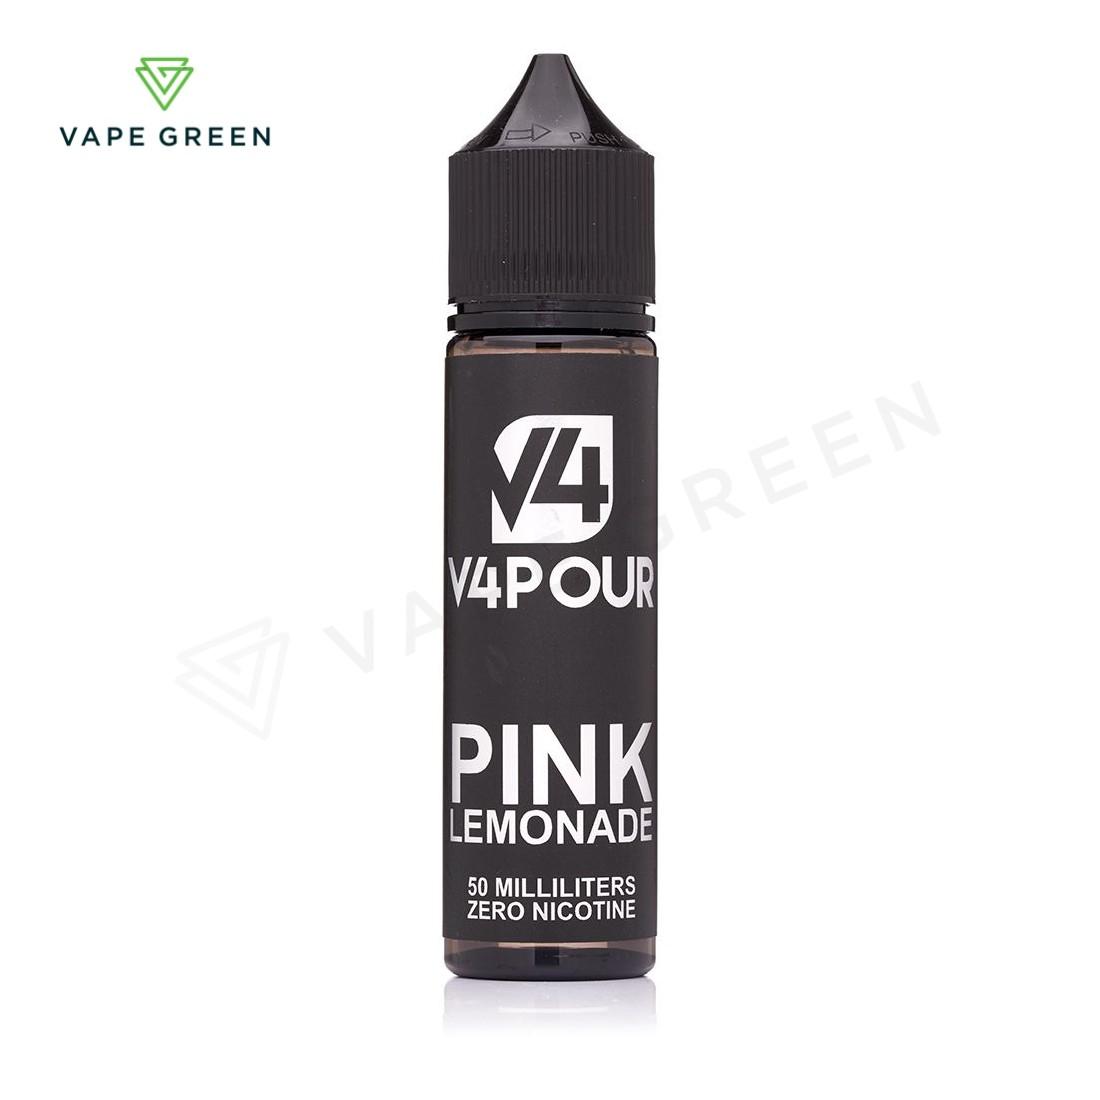 Pink Lemonade E-liquid by V4 Vapour 50ml